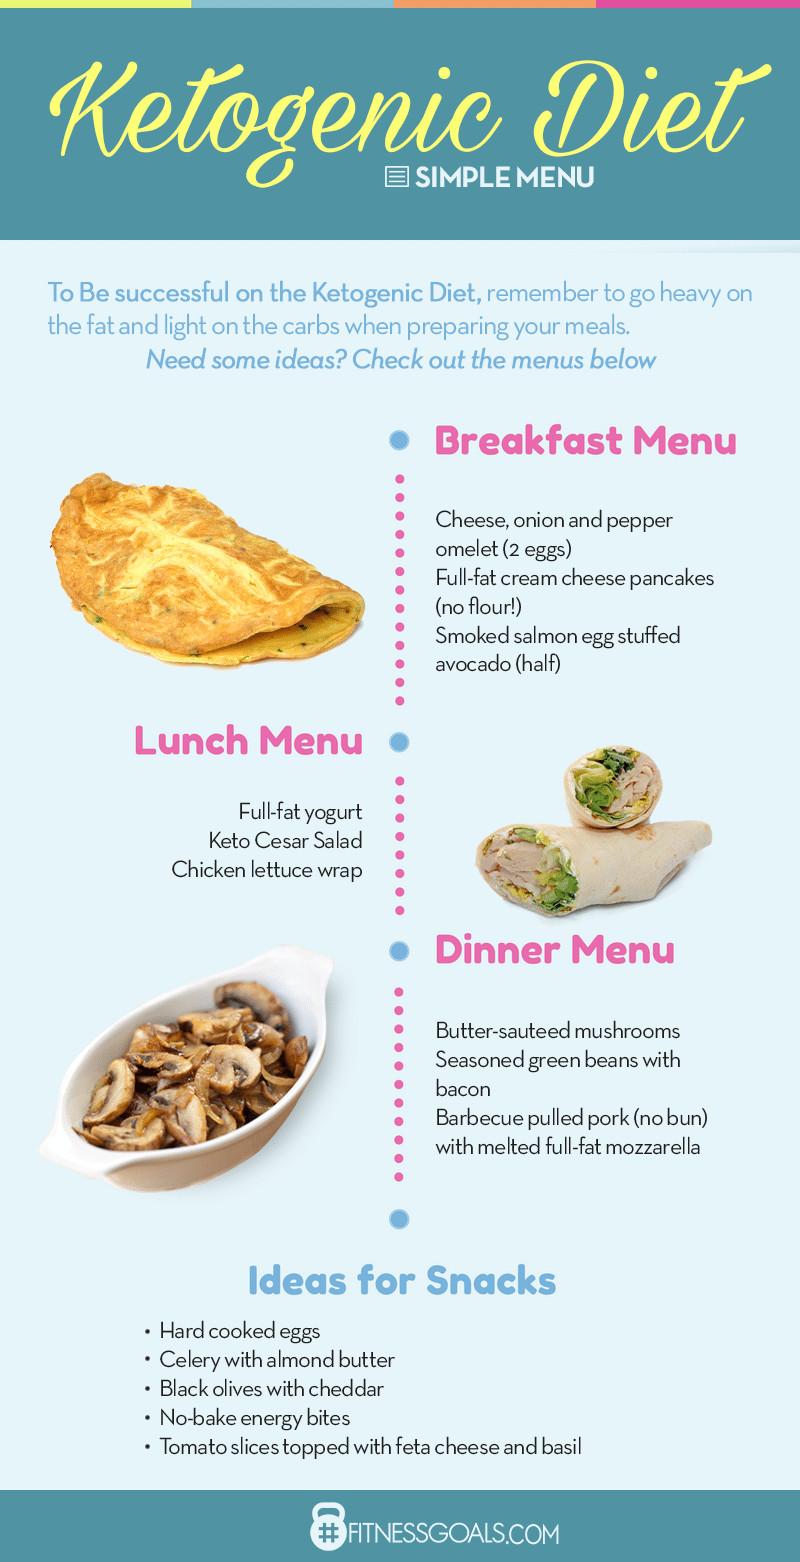 Keto Diet For Beginners Indian Meal Plan  Keto Diet Plan The plete Beginner's Guide